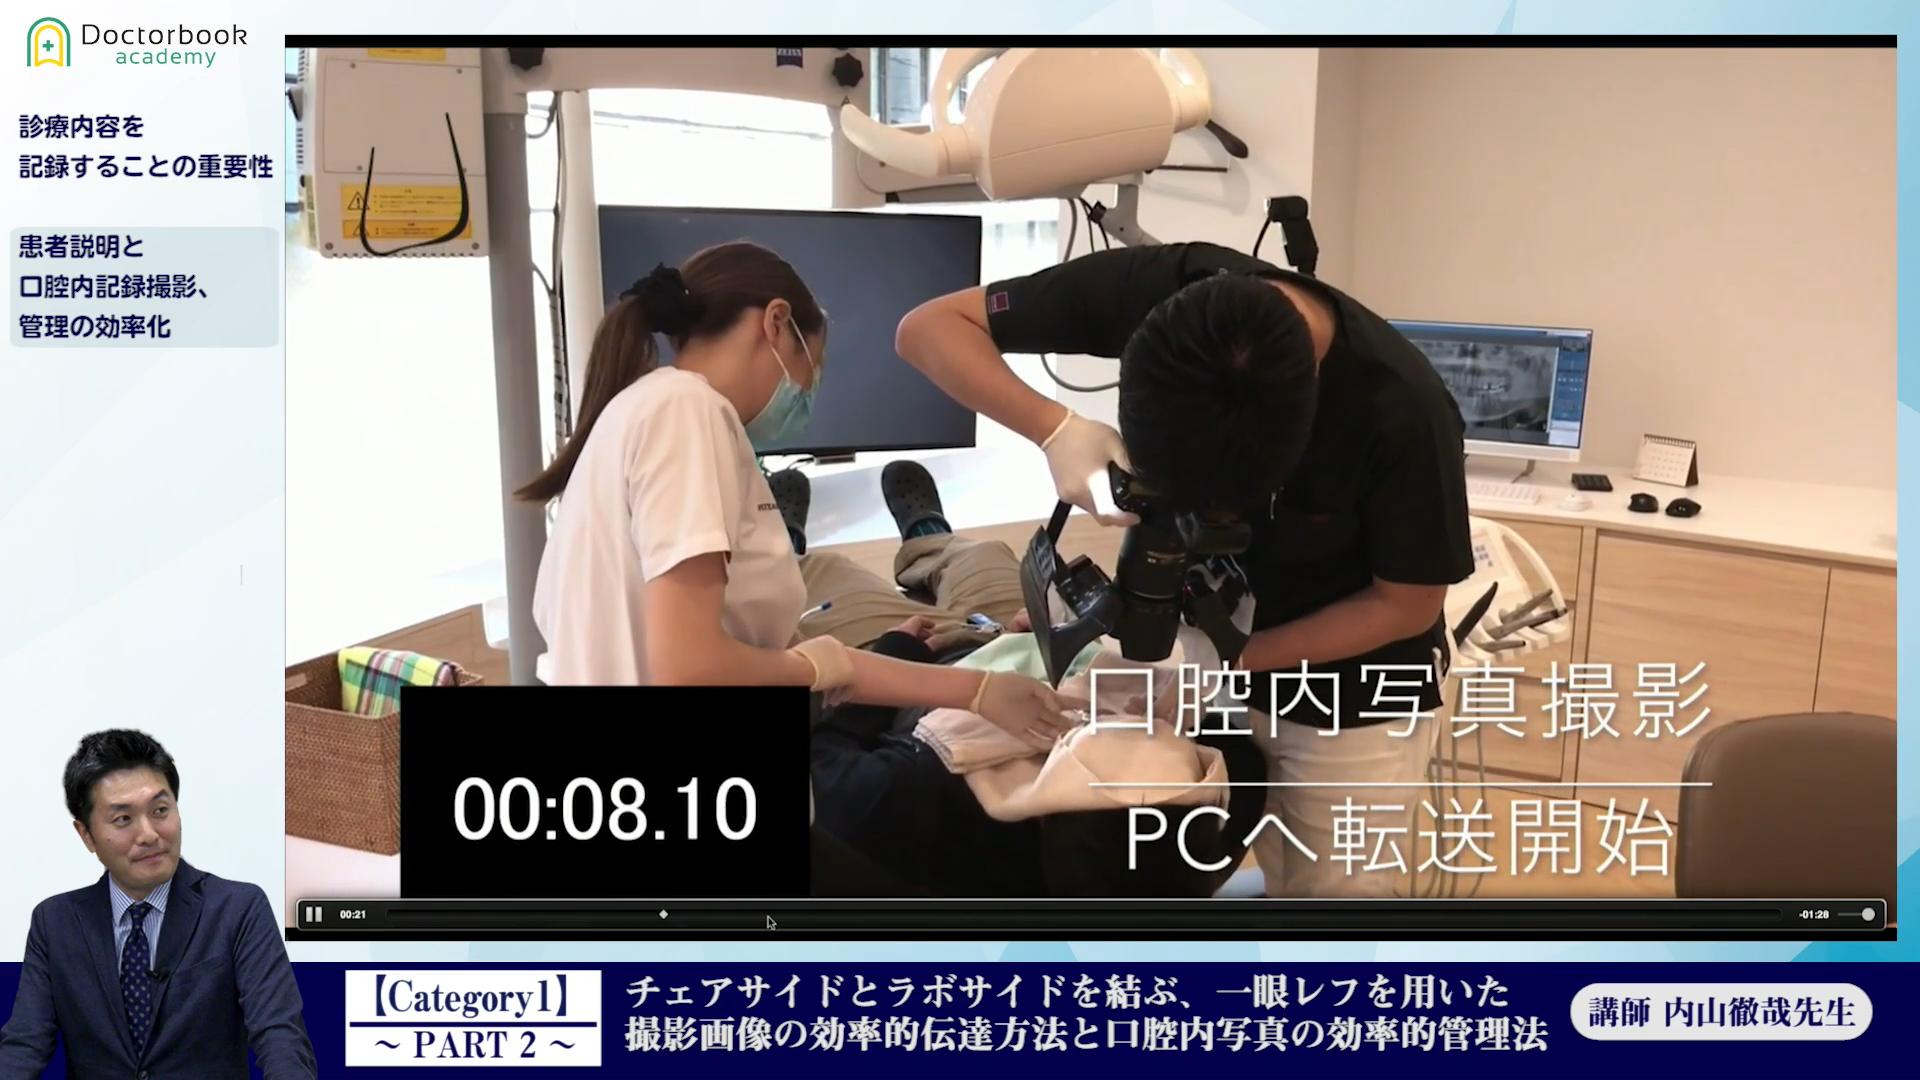 "Doctorbook academyコラム第29回日本老年歯科医学会学術大会""参加レポート"""